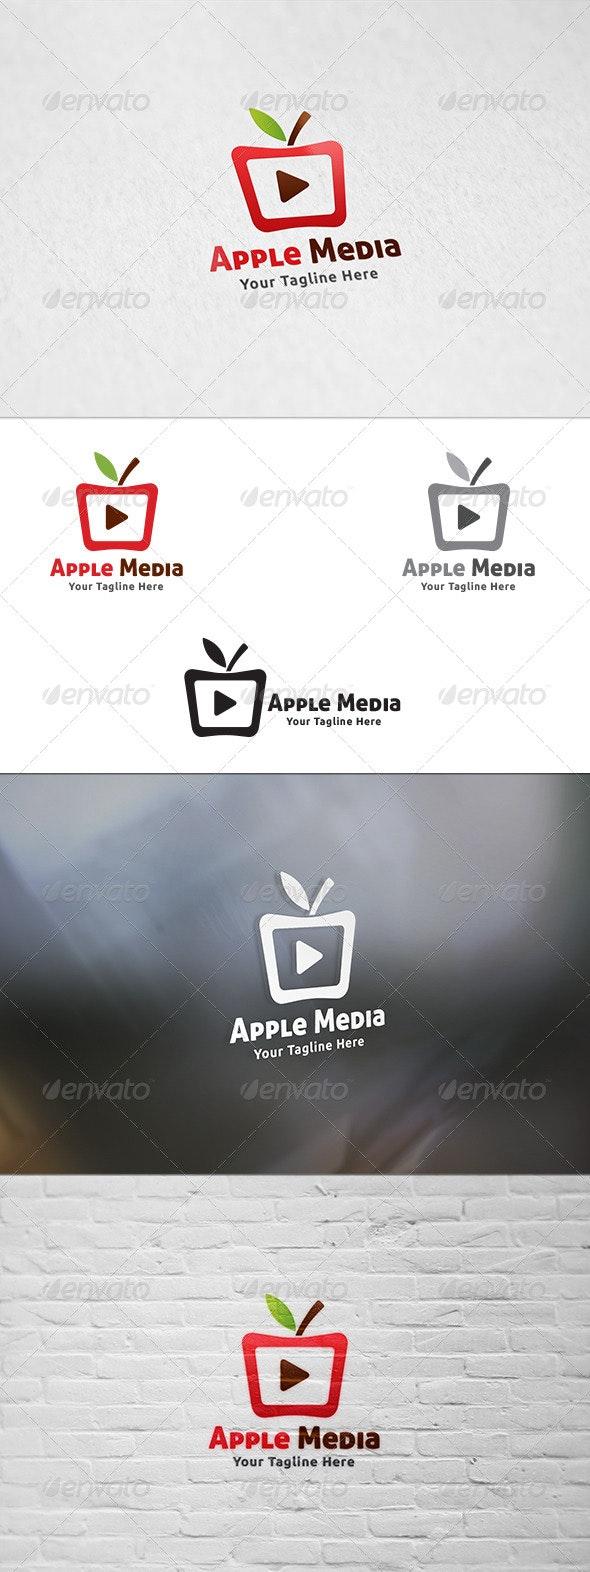 Apple Media - Logo Template